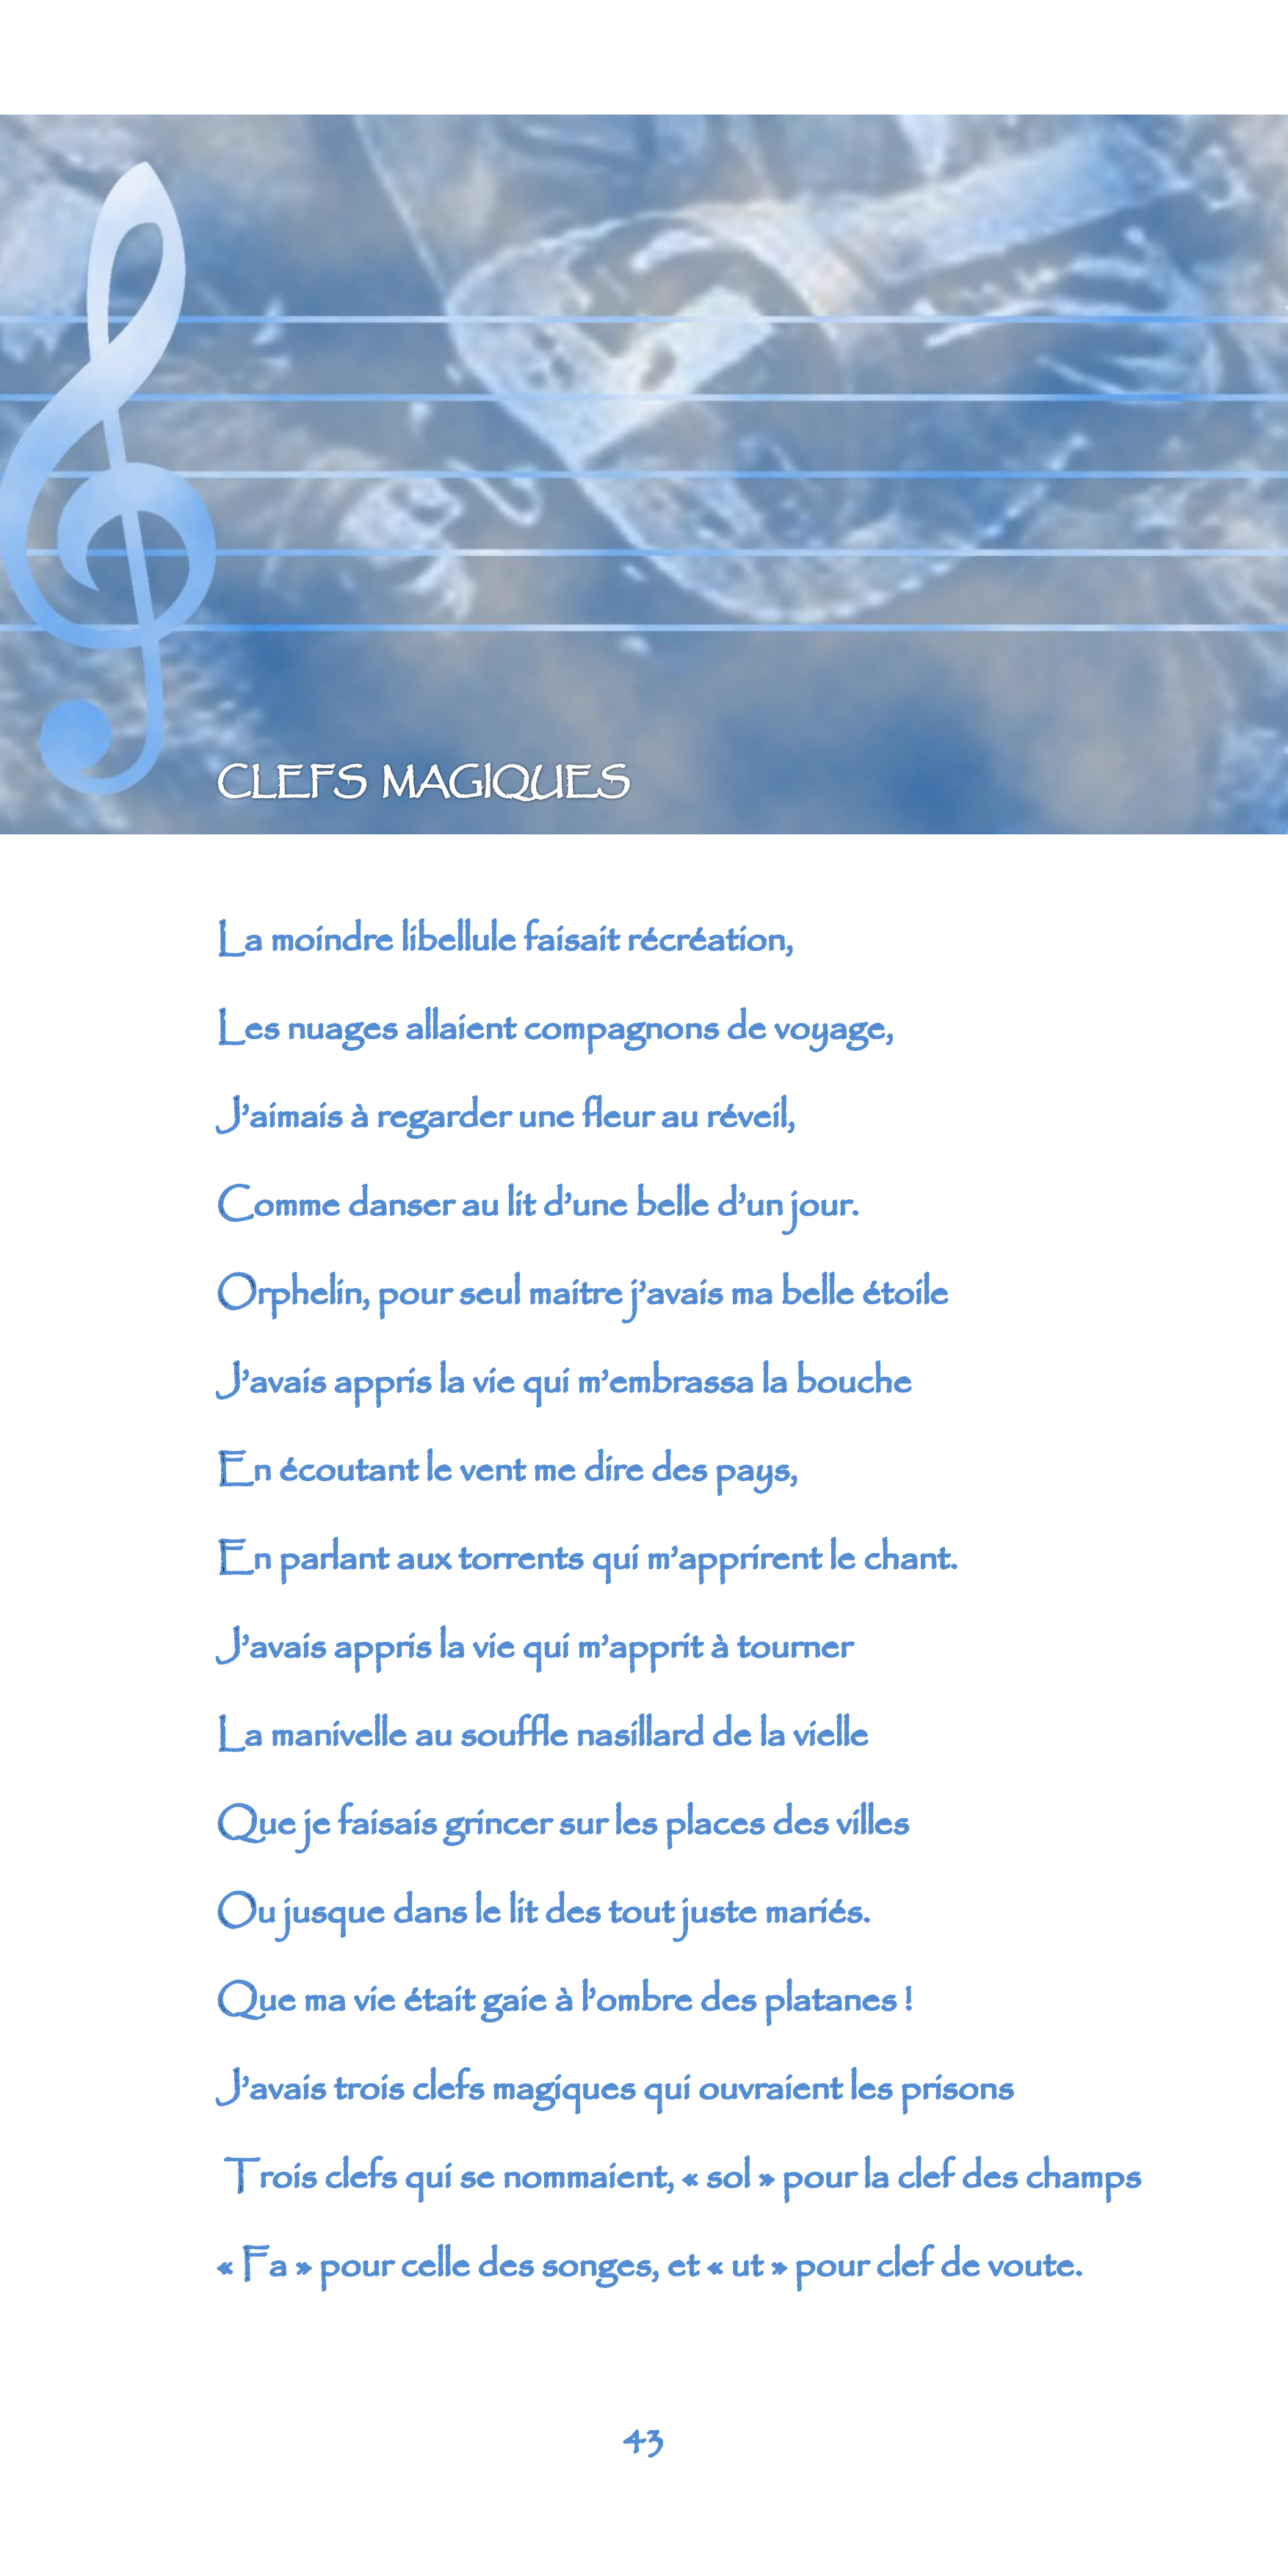 43-nègre_bleu-clefs_magiques.jpg